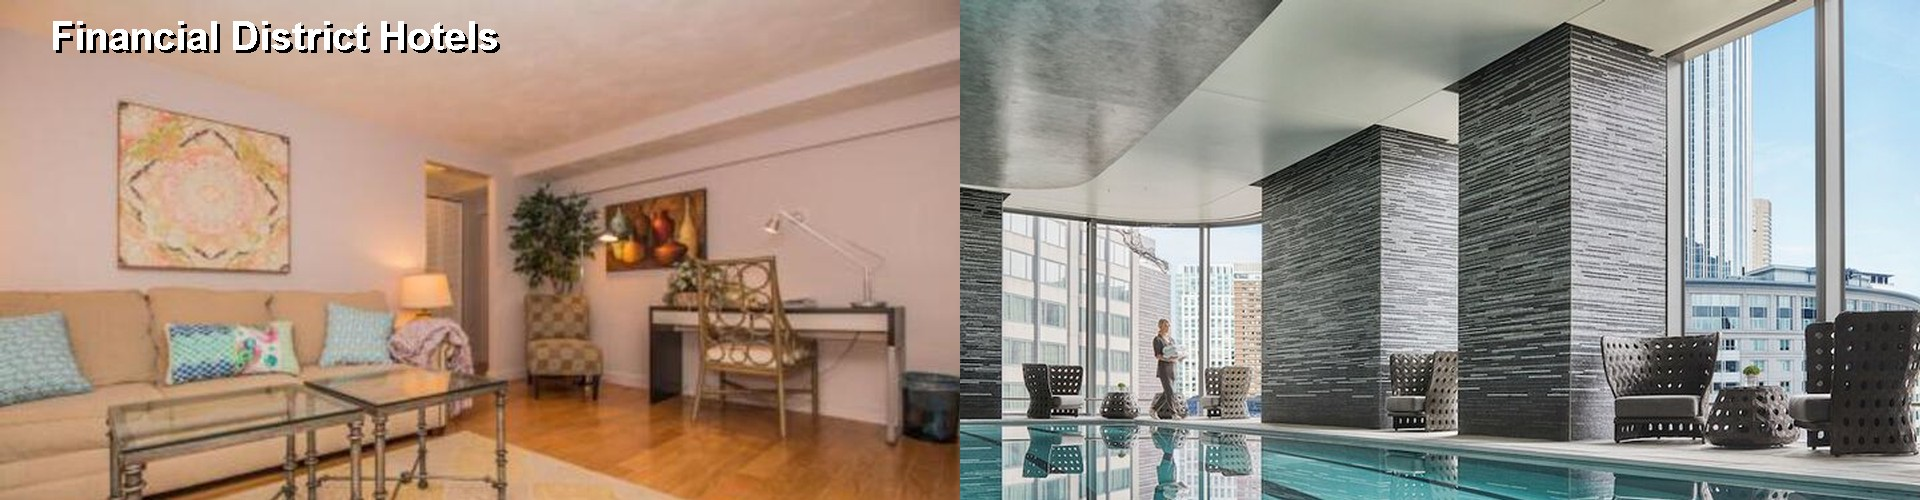 5 Best Hotels Near Financial District